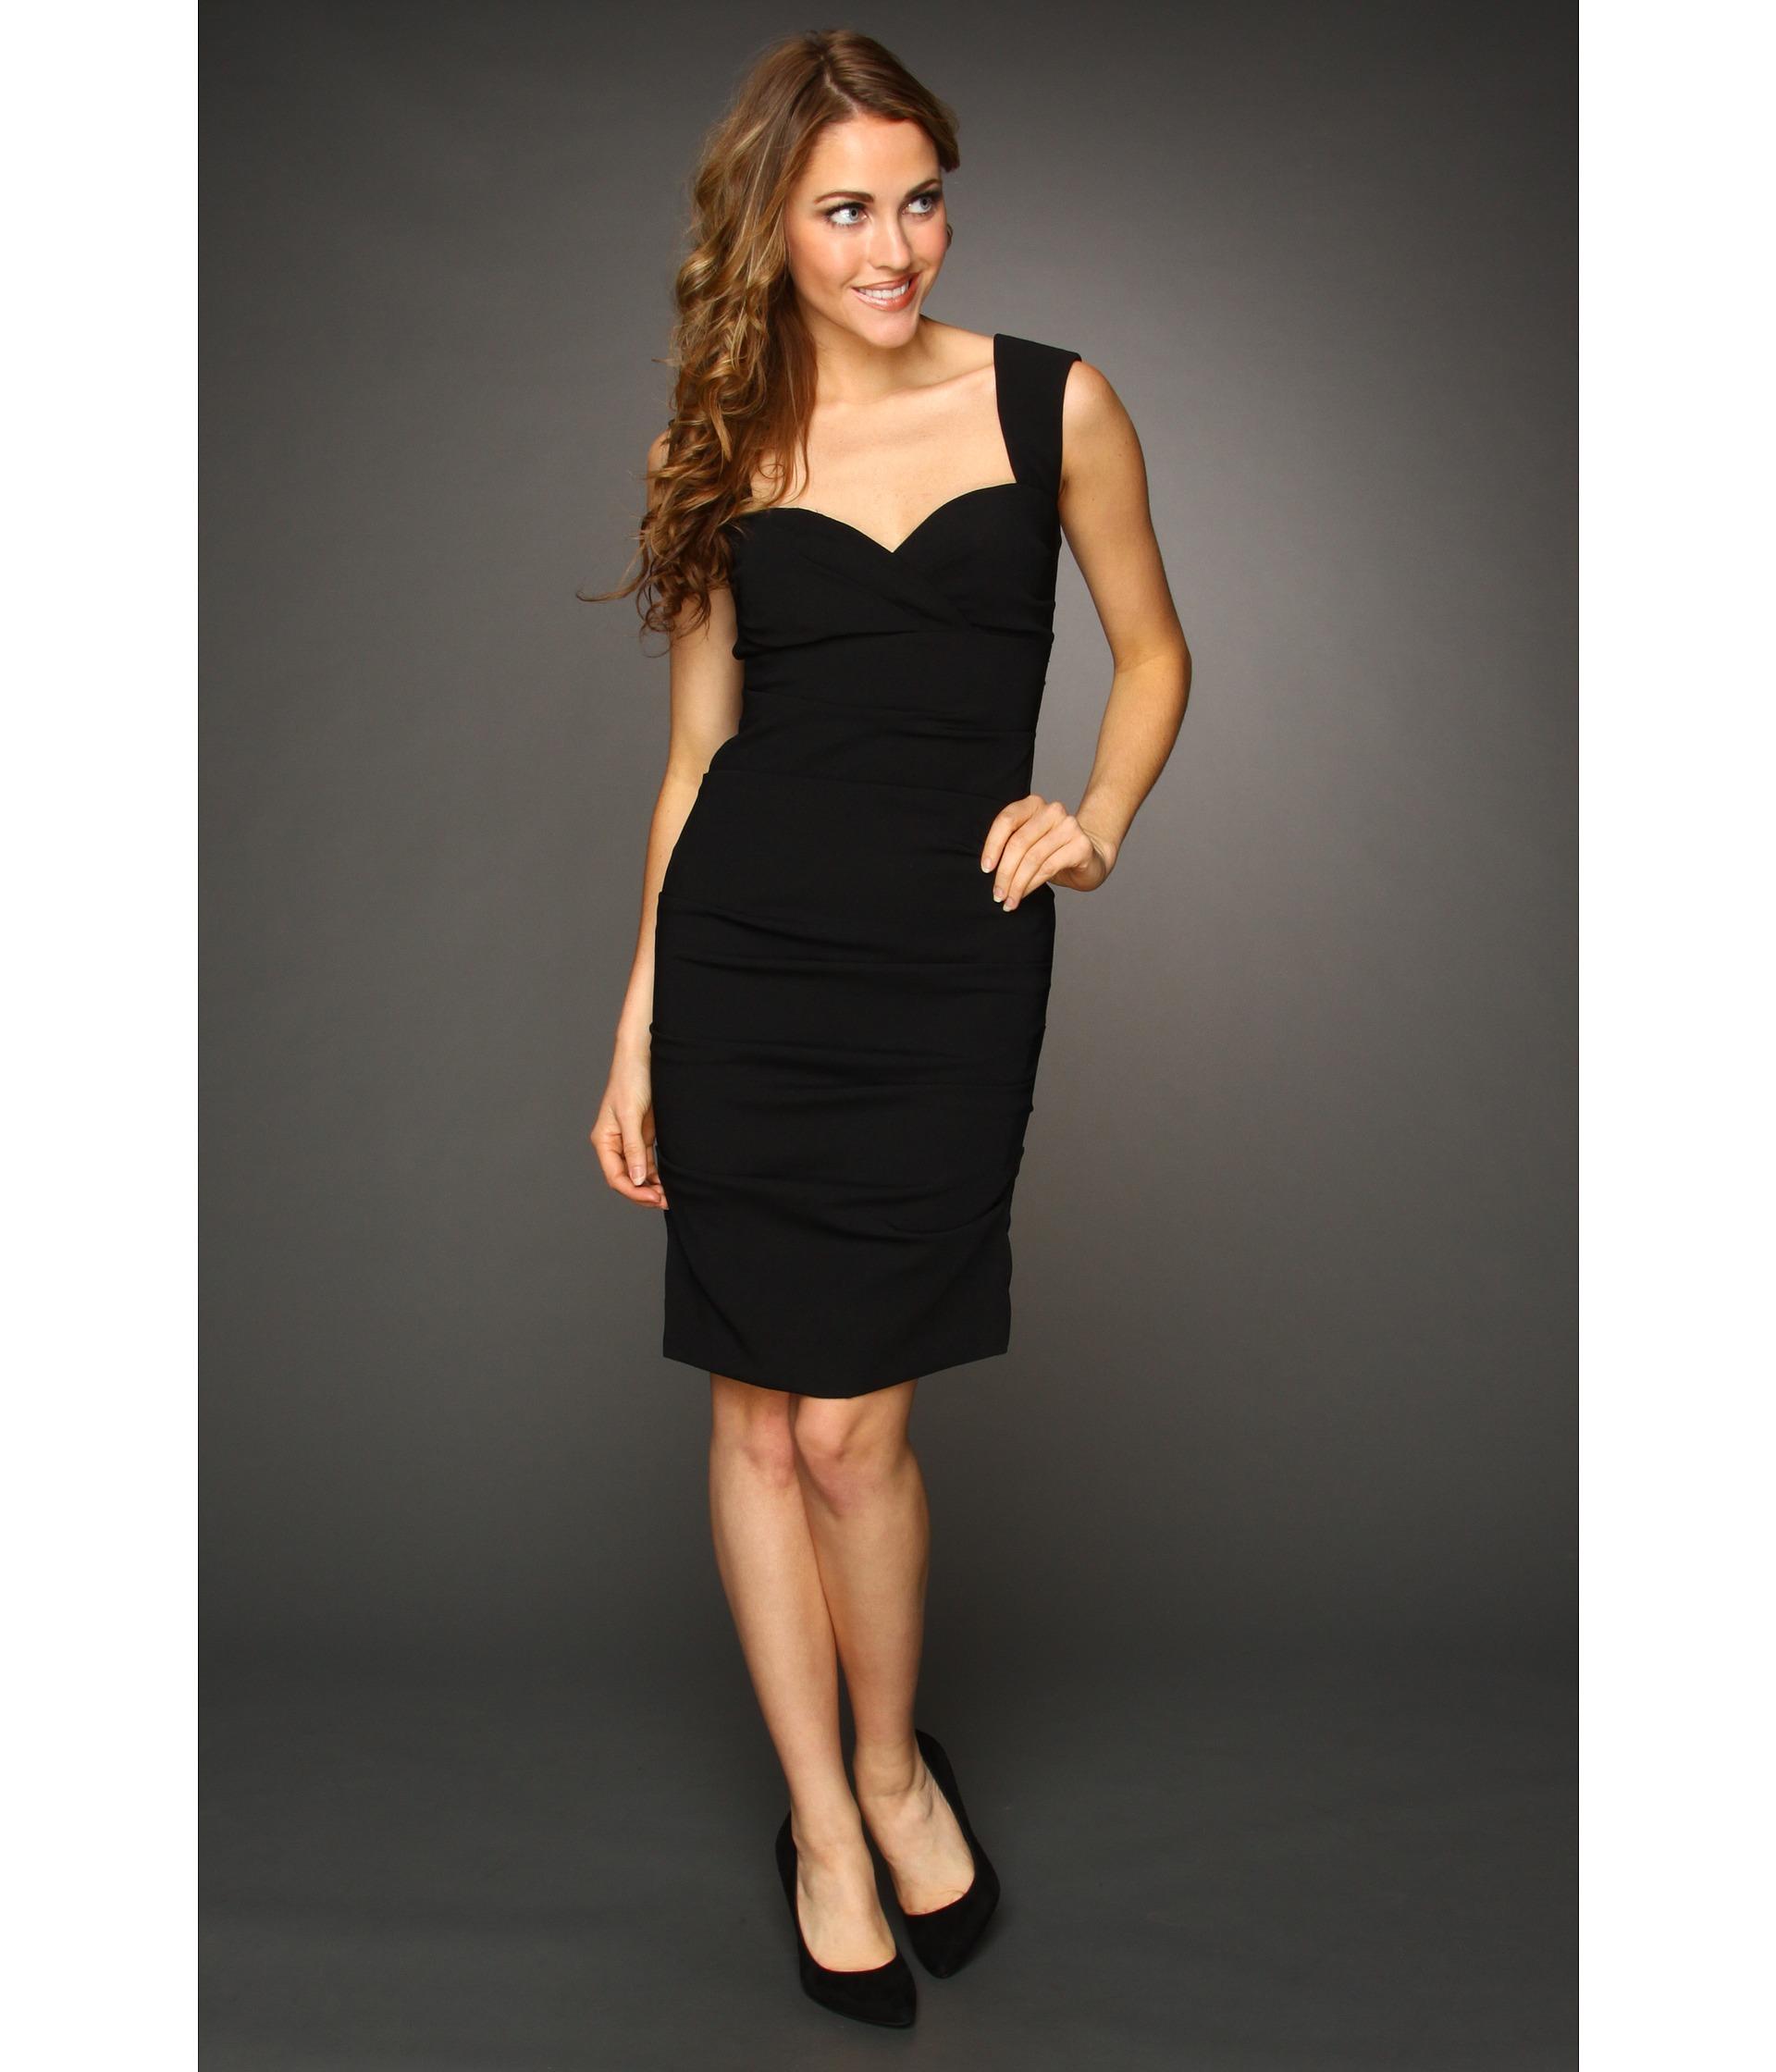 nicole miller satin crepe tucked dress $ 385 00 nicole